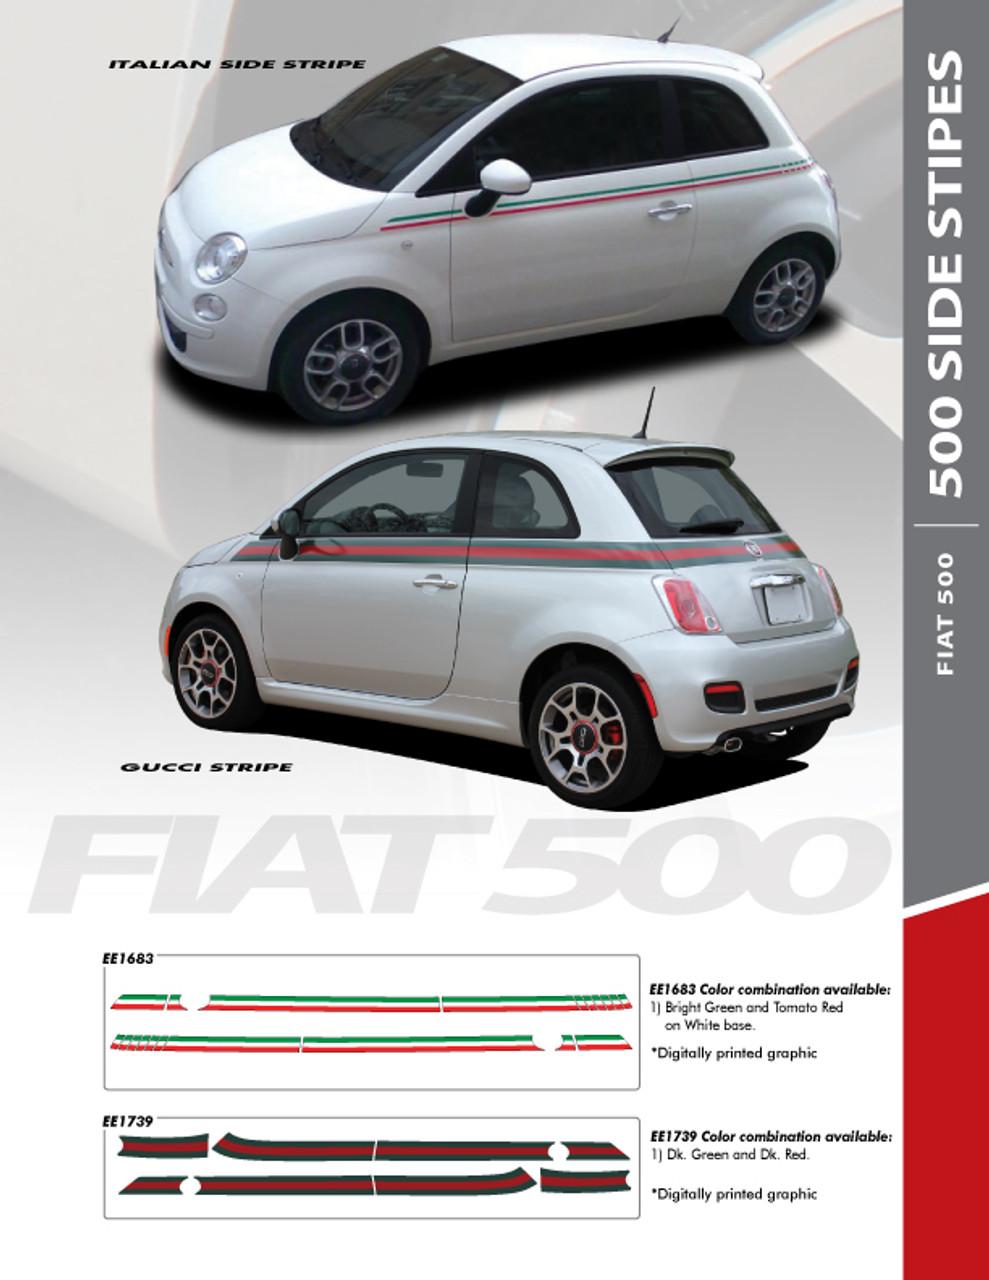 Se 5 Italian Applique Stripe 2011 2016 Fiat 500 Gucci Style Abarth Door To Rear Wrap Around Vinyl Graphics Stripes Decals Kit